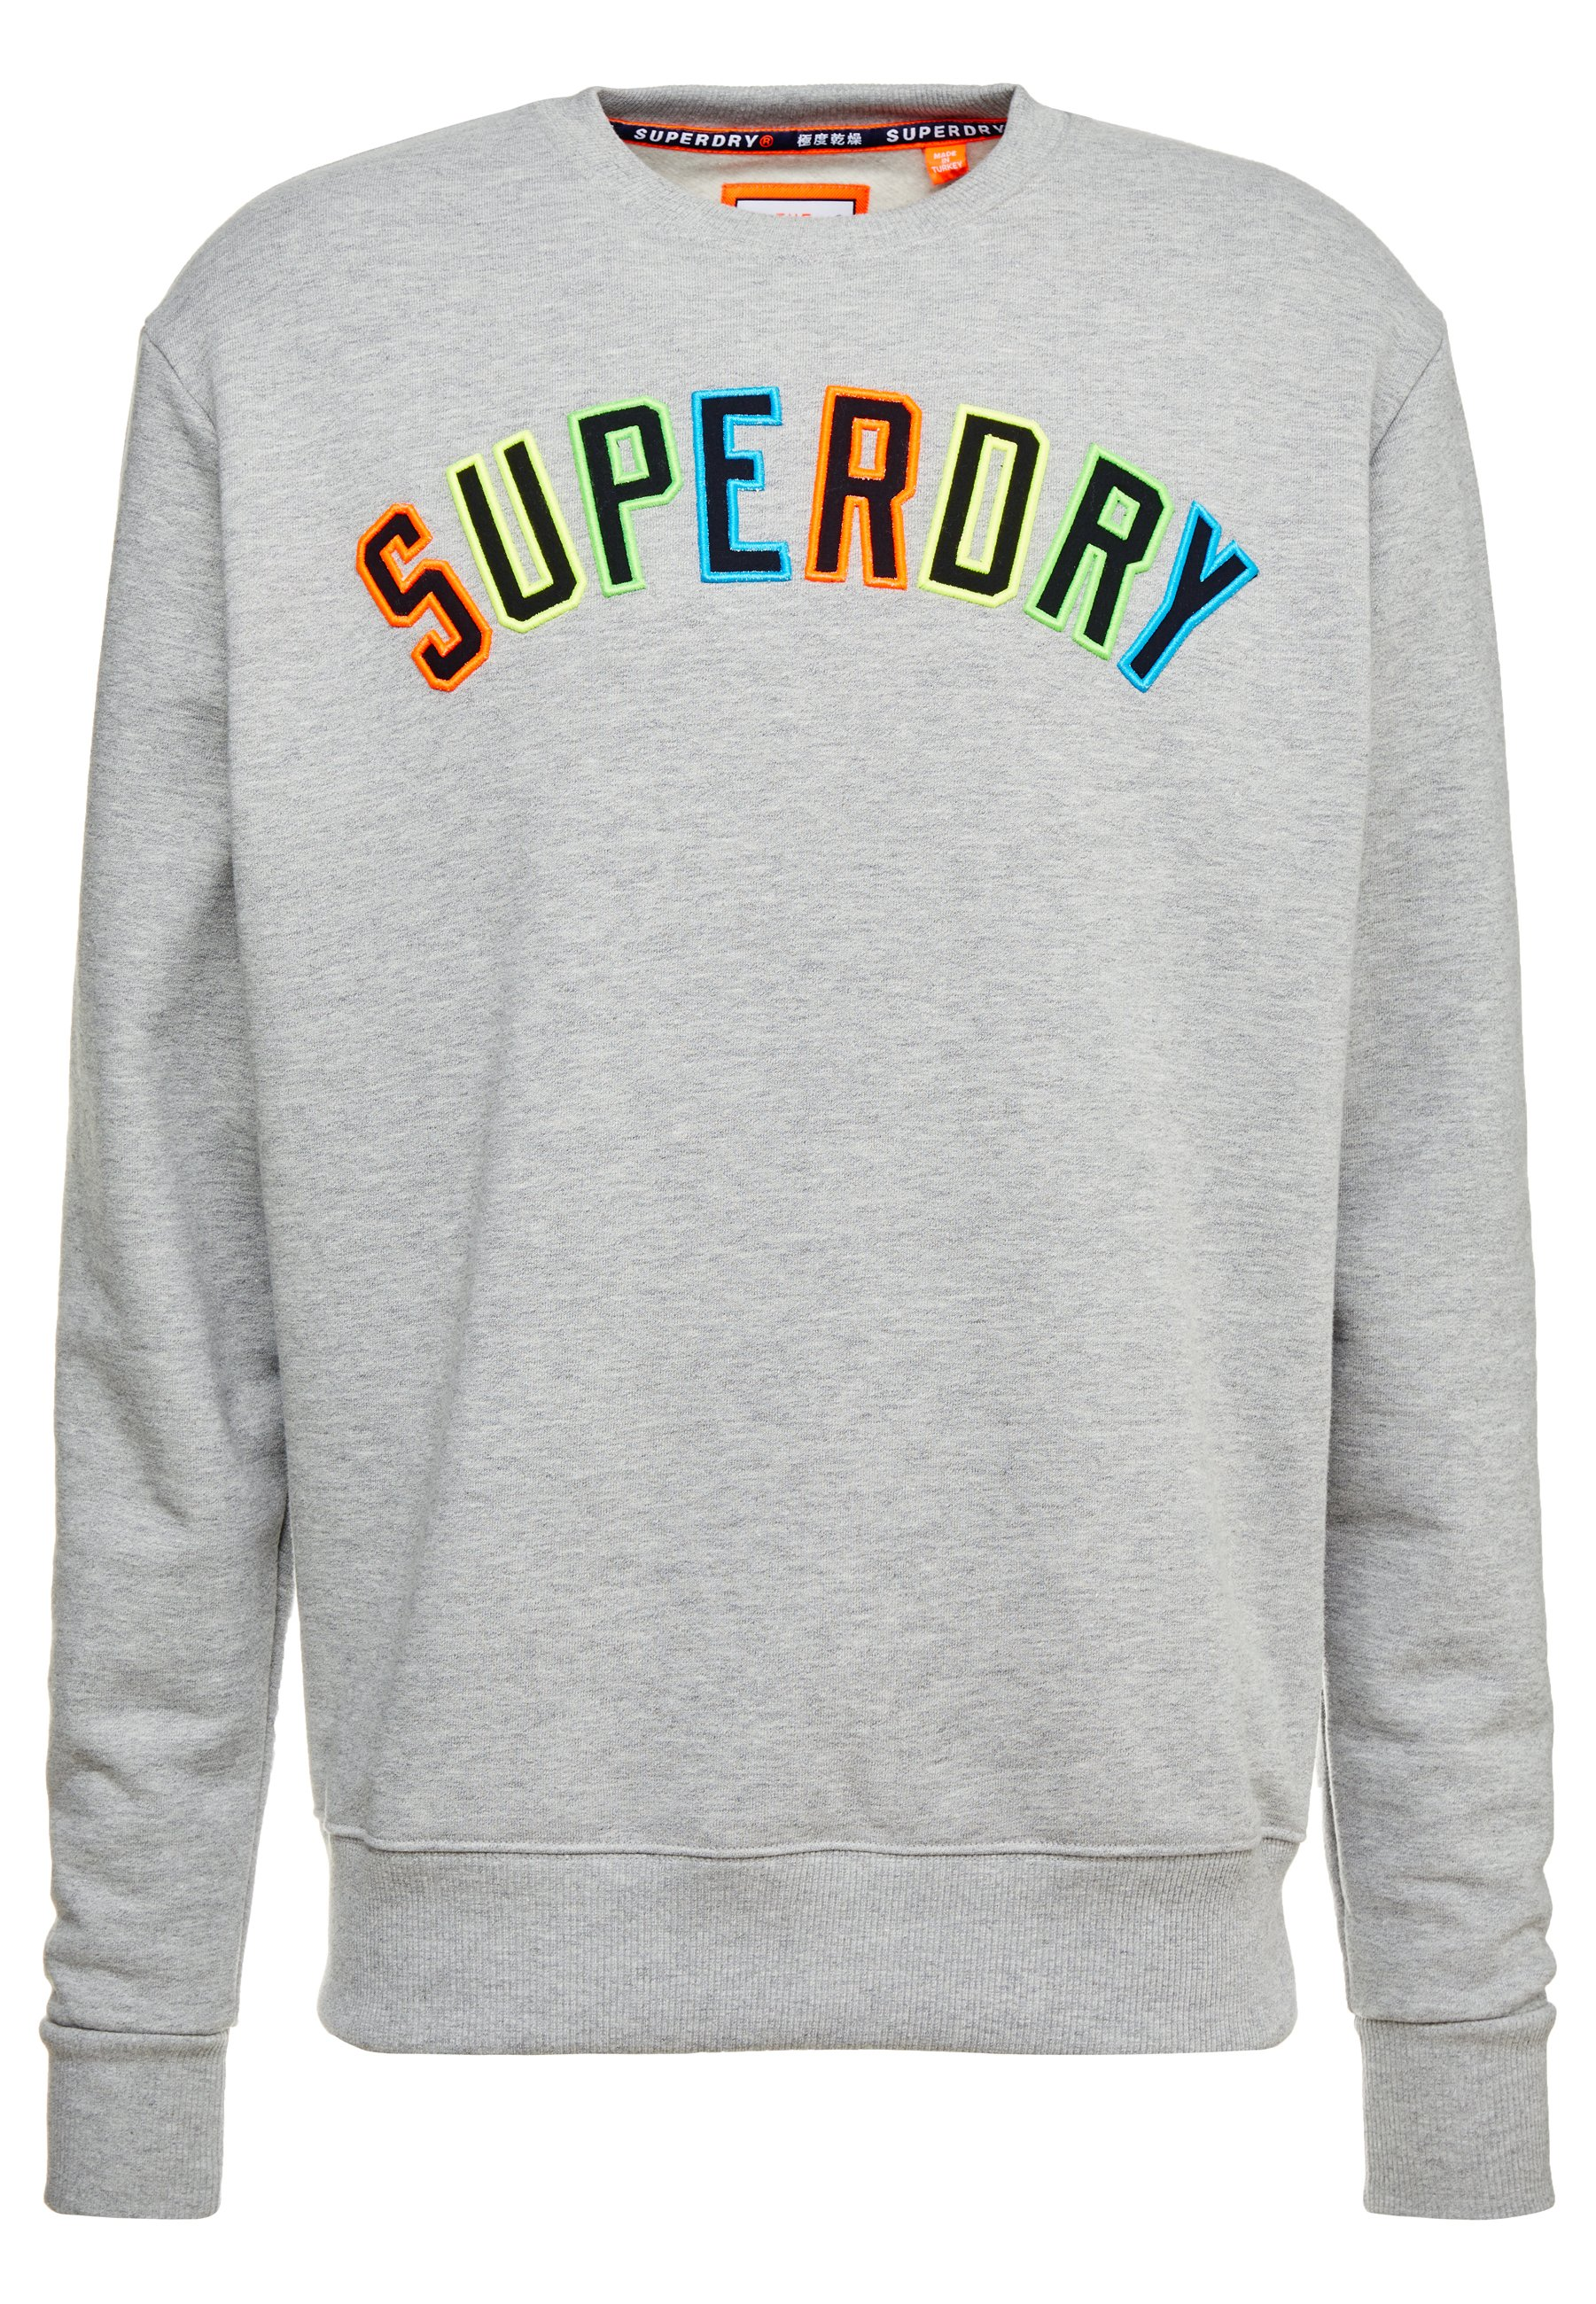 Superdry New House Rules Applique Crew - Sweatshirt Varsity Silver Grit Black Friday